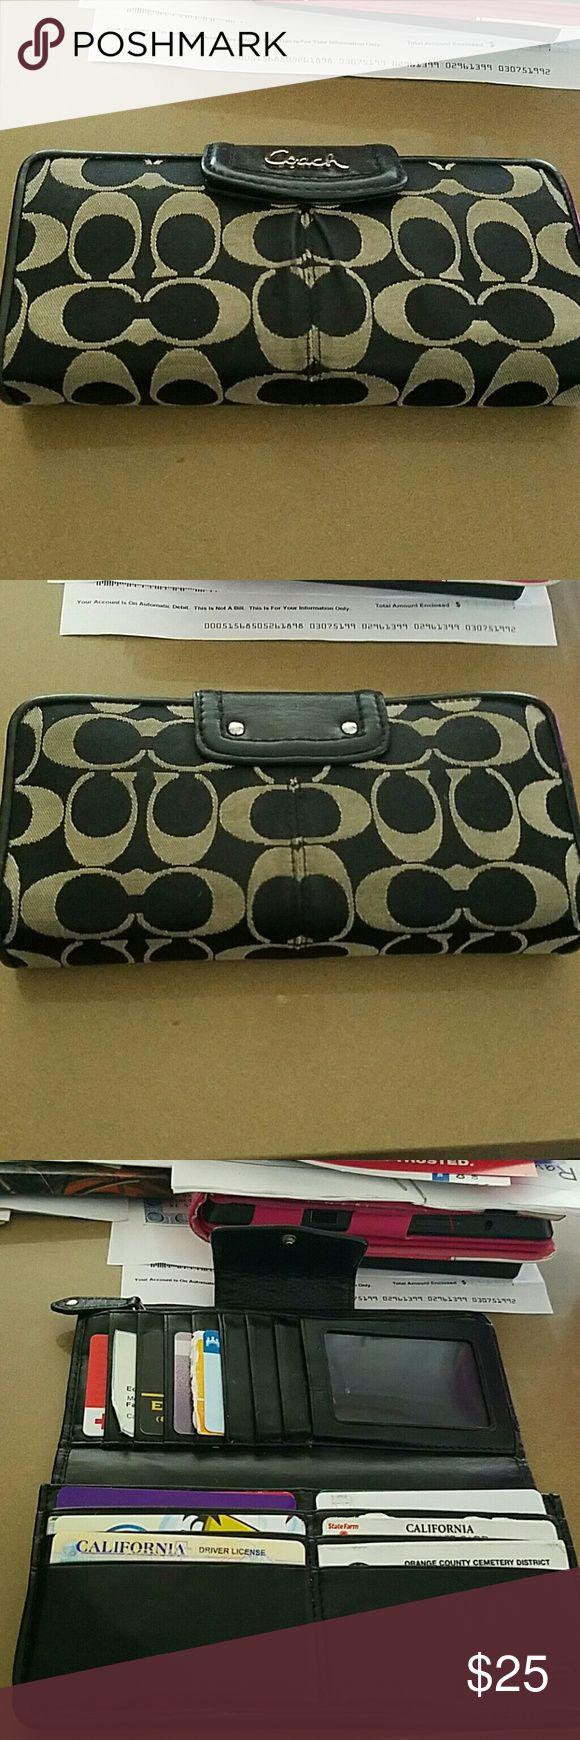 Black Coach Wallet Black coach wallet. It's been used but still looks great. Coach Bags Wallets